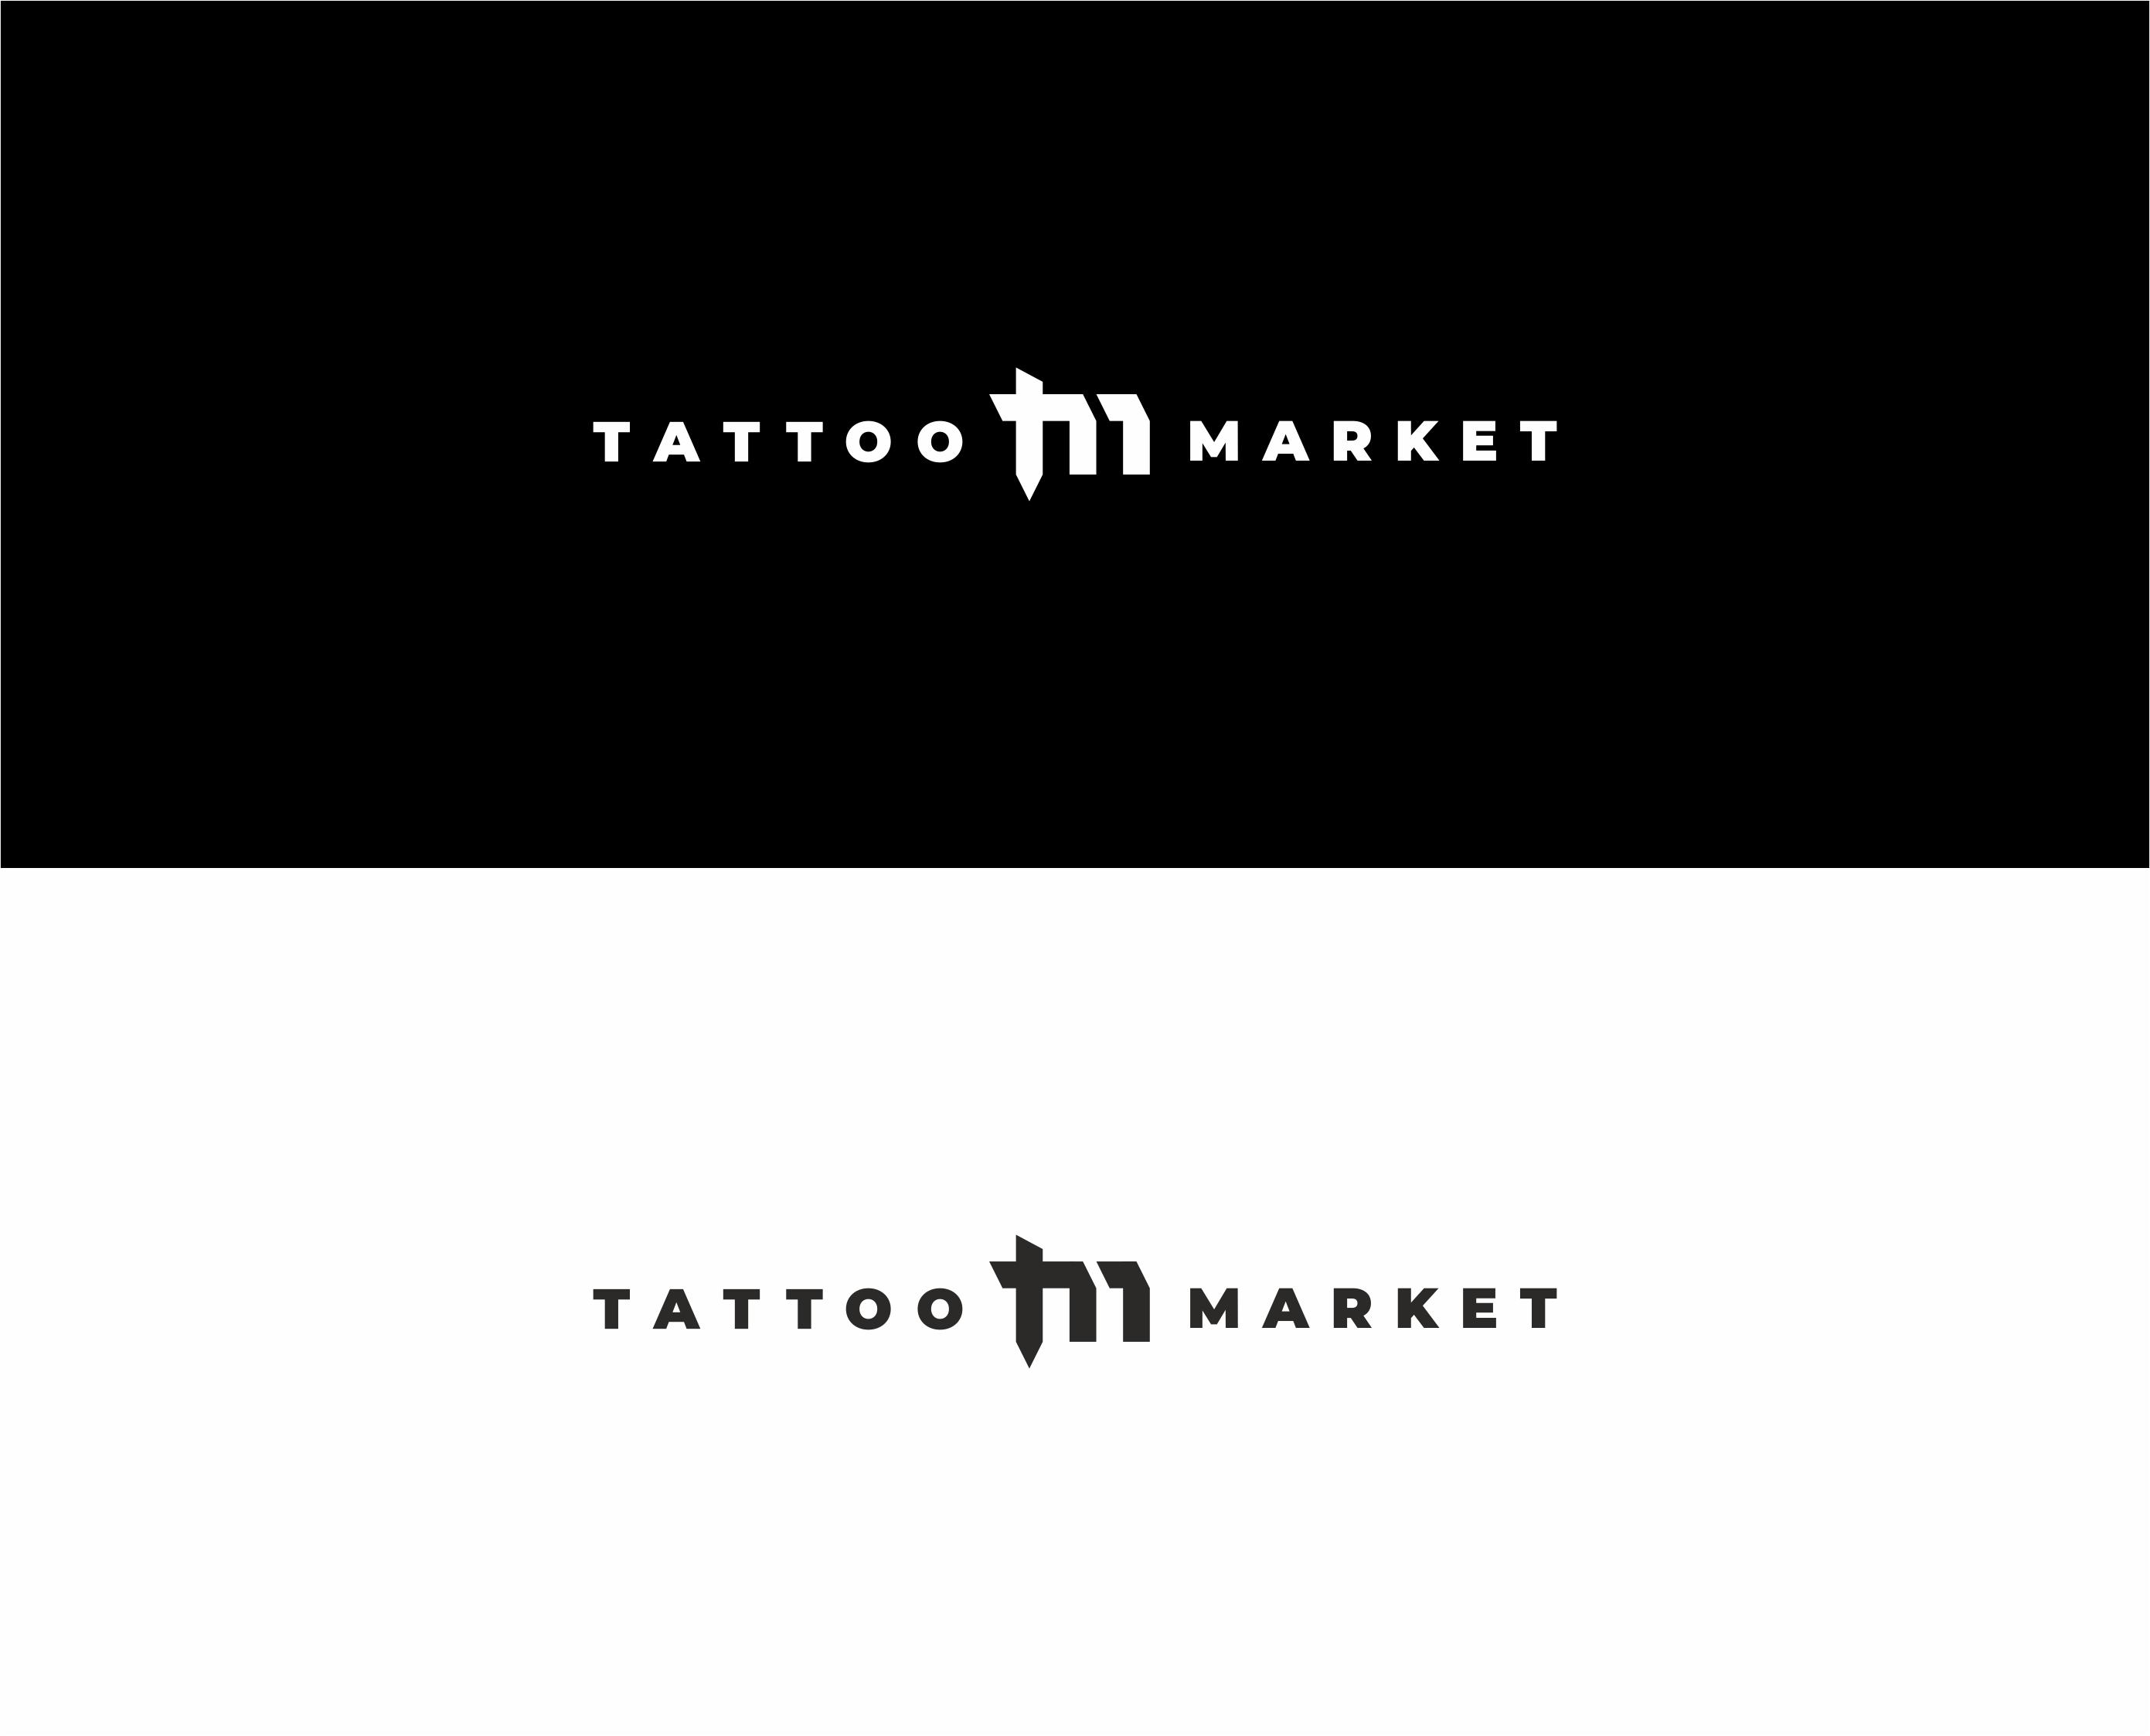 Редизайн логотипа магазина тату оборудования TattooMarket.ru фото f_1815c3edec51ca13.jpg